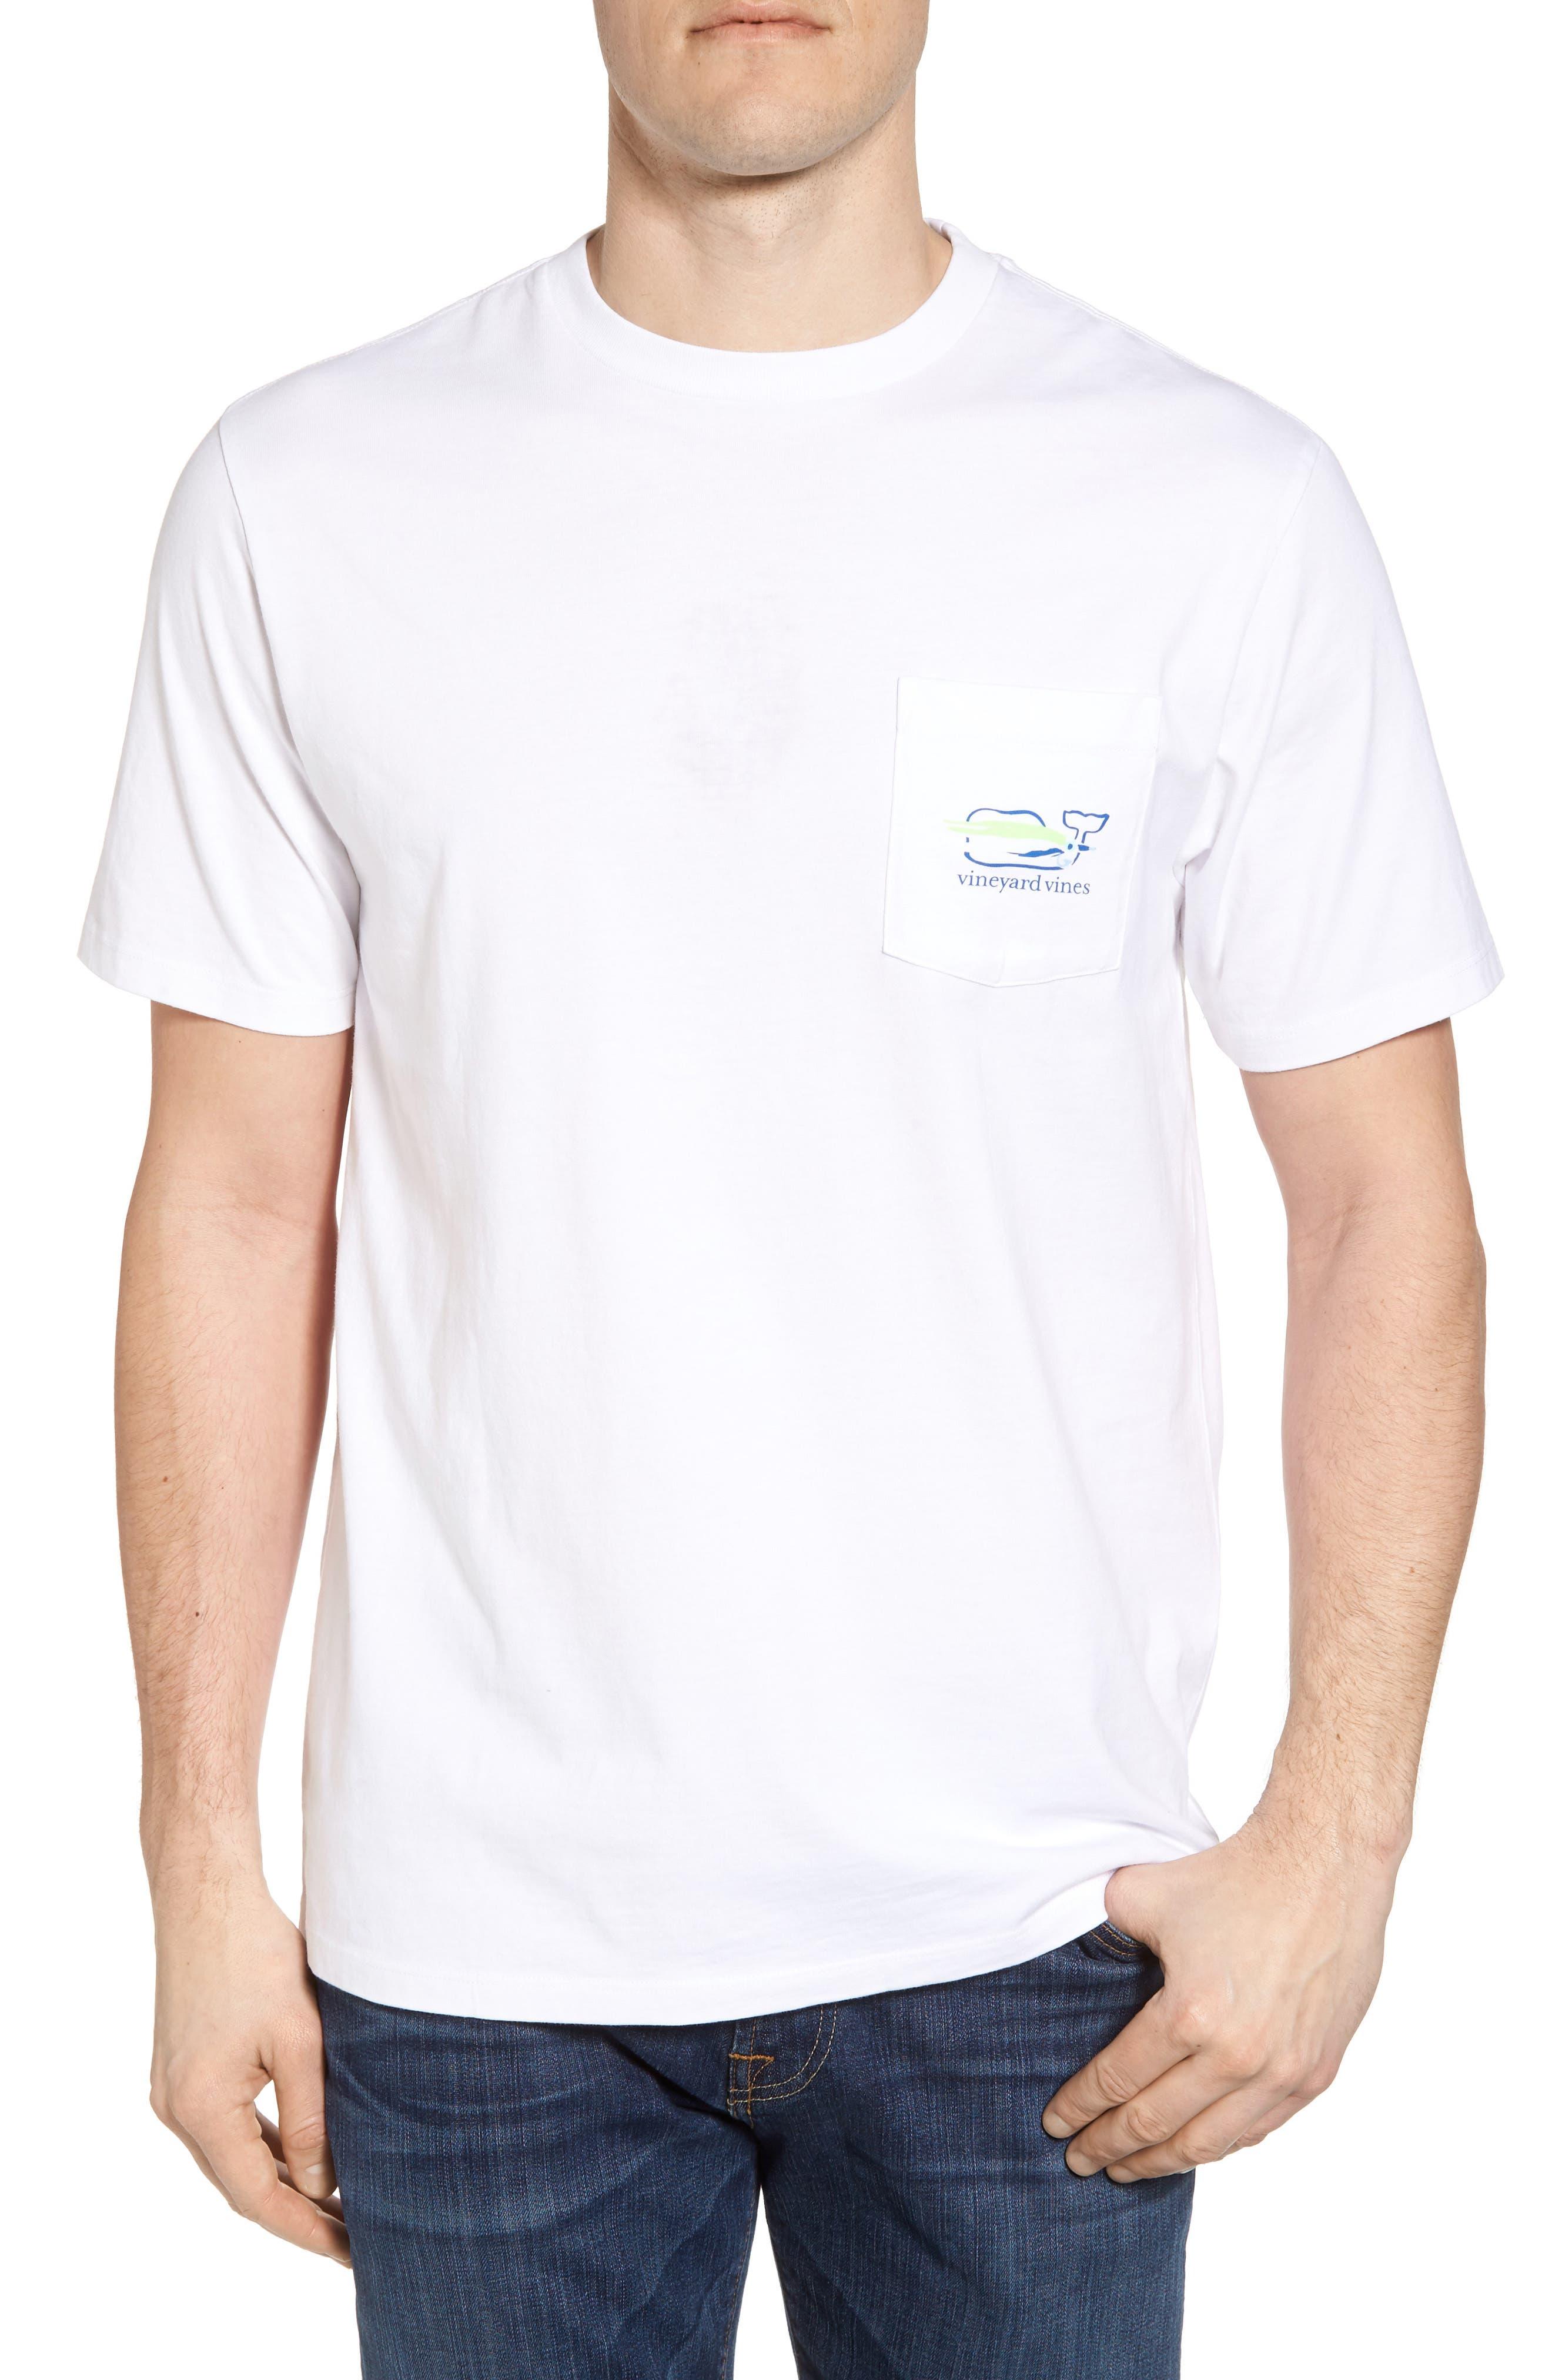 vineyard vines Fishing Excursion T-Shirt